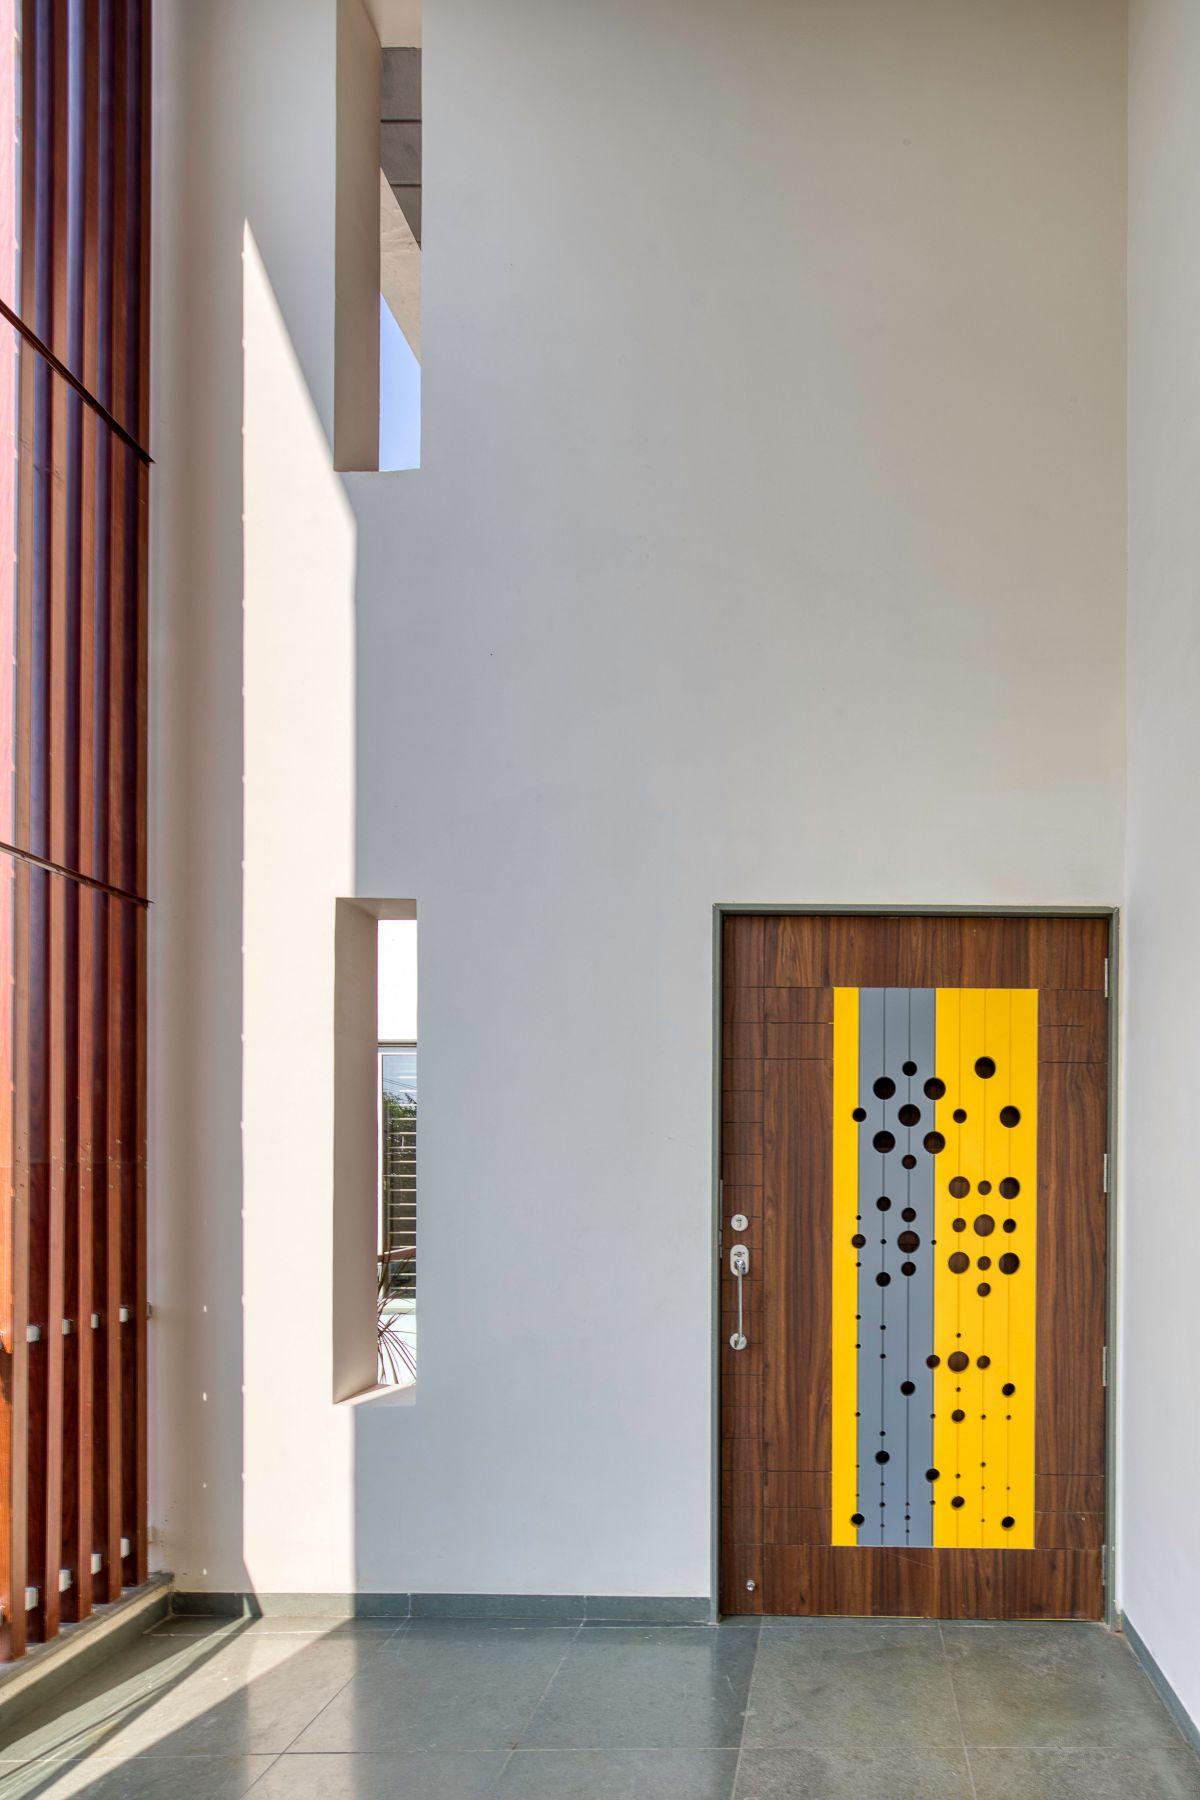 Clay roof tiles façade to minimize heat gain and has decorative function, at Vadodara, by Manoj Patel Design Studio 31